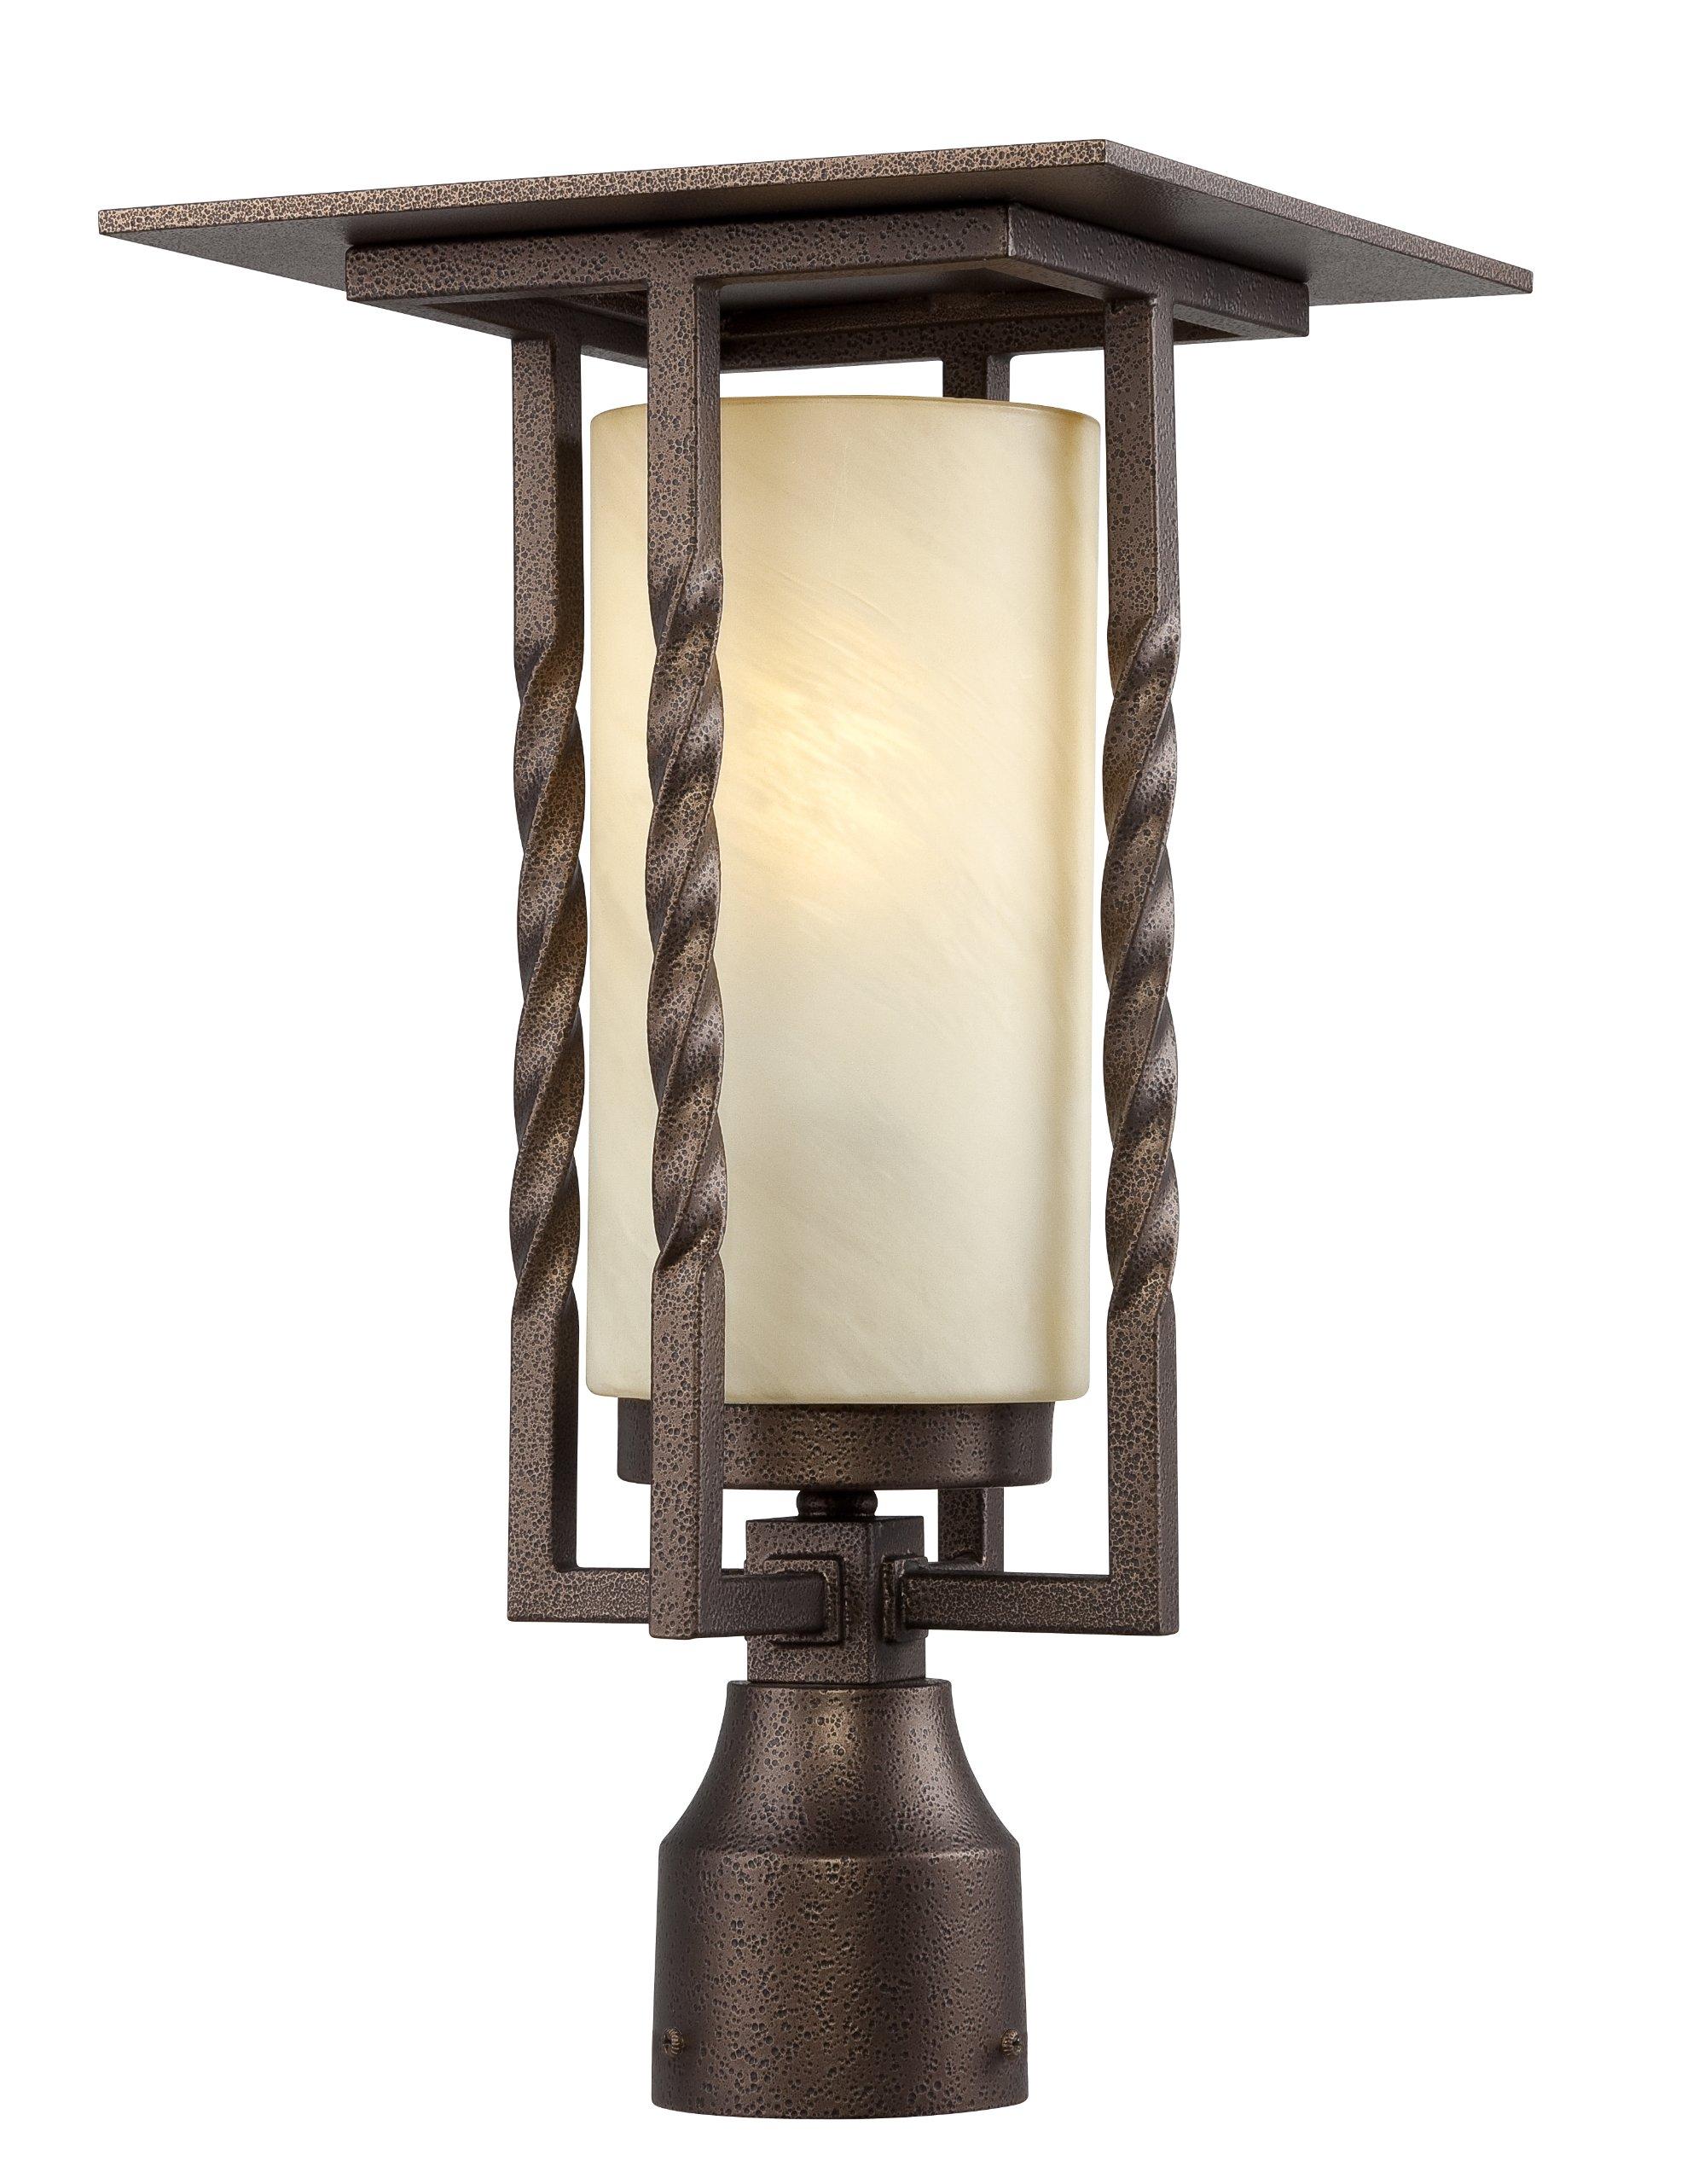 Designers Fountain FL31936-FBZ Parkview Post Lanterns, Flemish Bronze